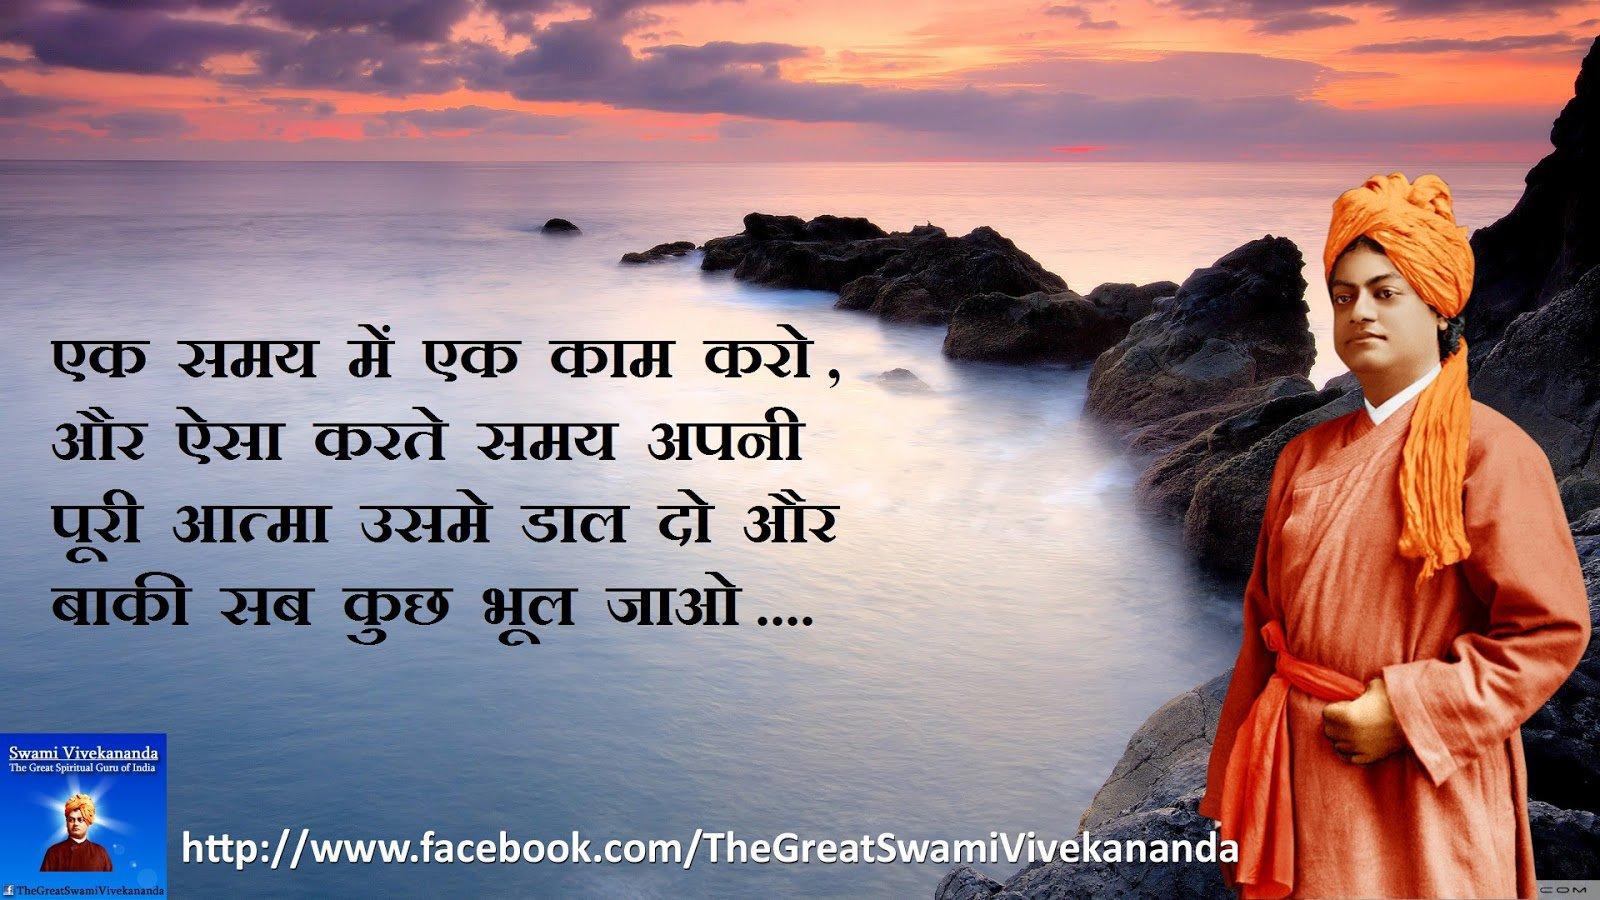 Swami Vivekananda Quotes Wallpaper HD 12415   Baltana 1600x900